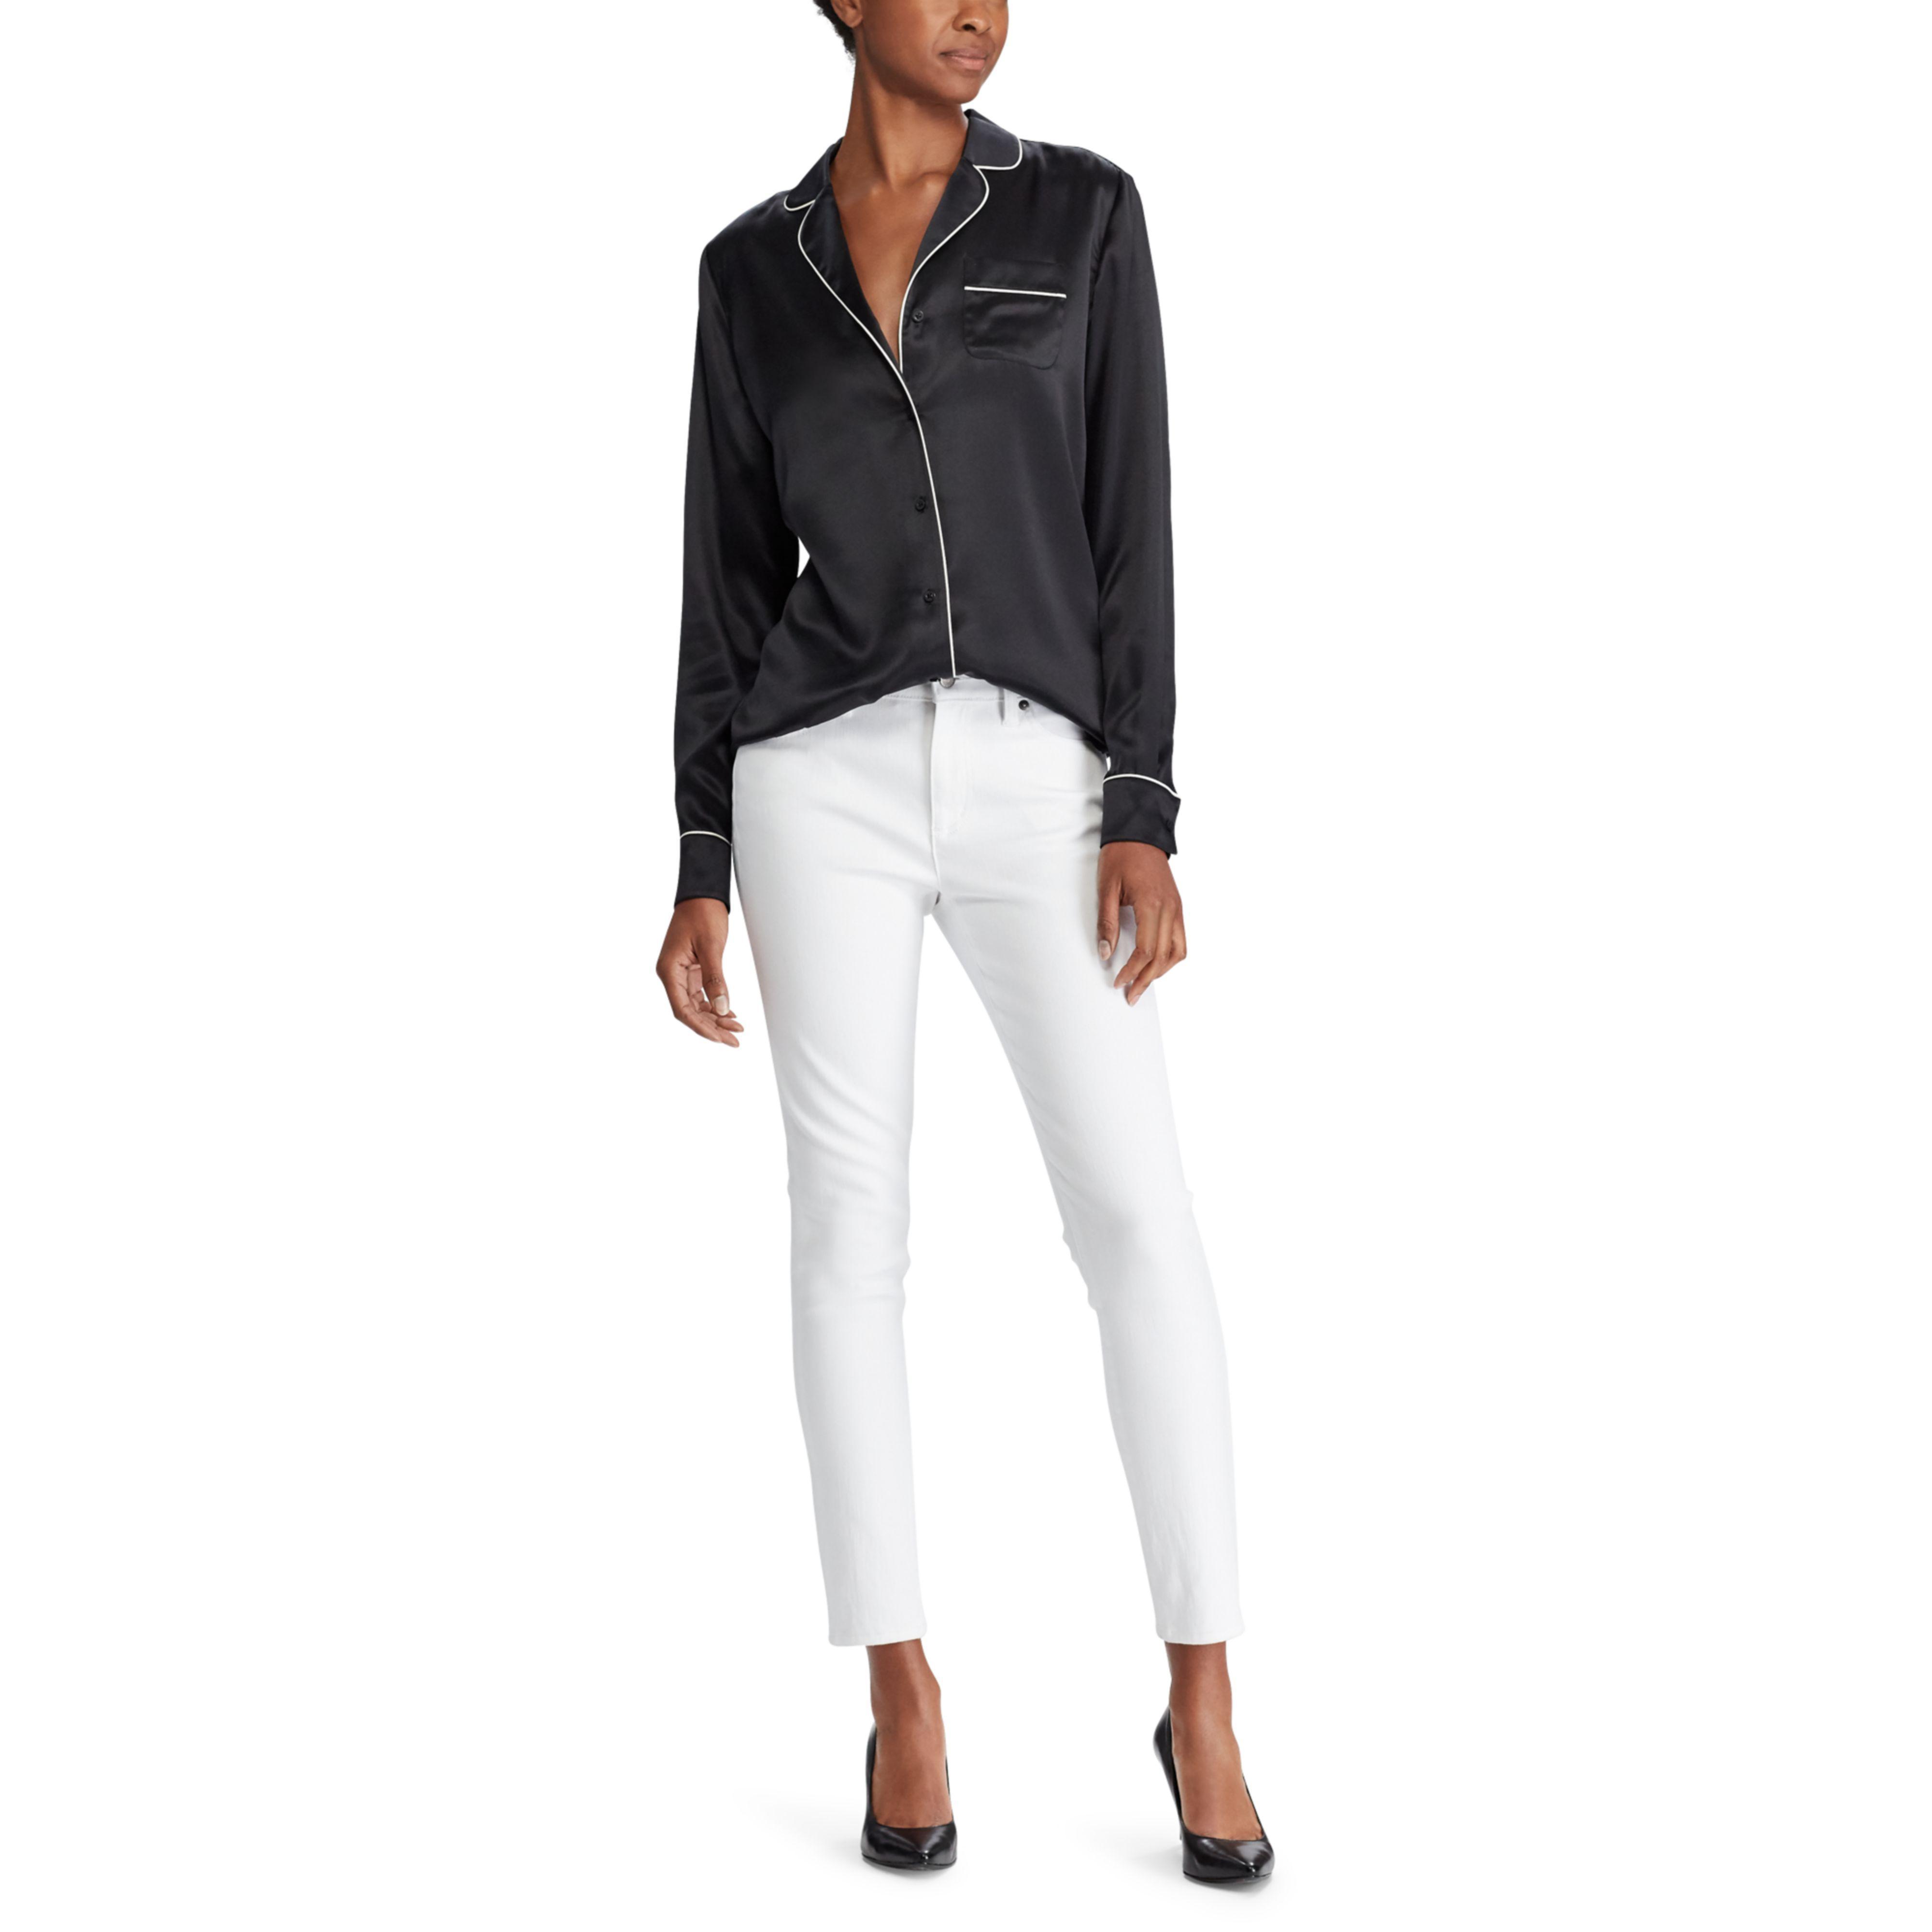 ca900b884c Lyst - Ralph Lauren Silk Charmeuse Pajama Shirt in Black